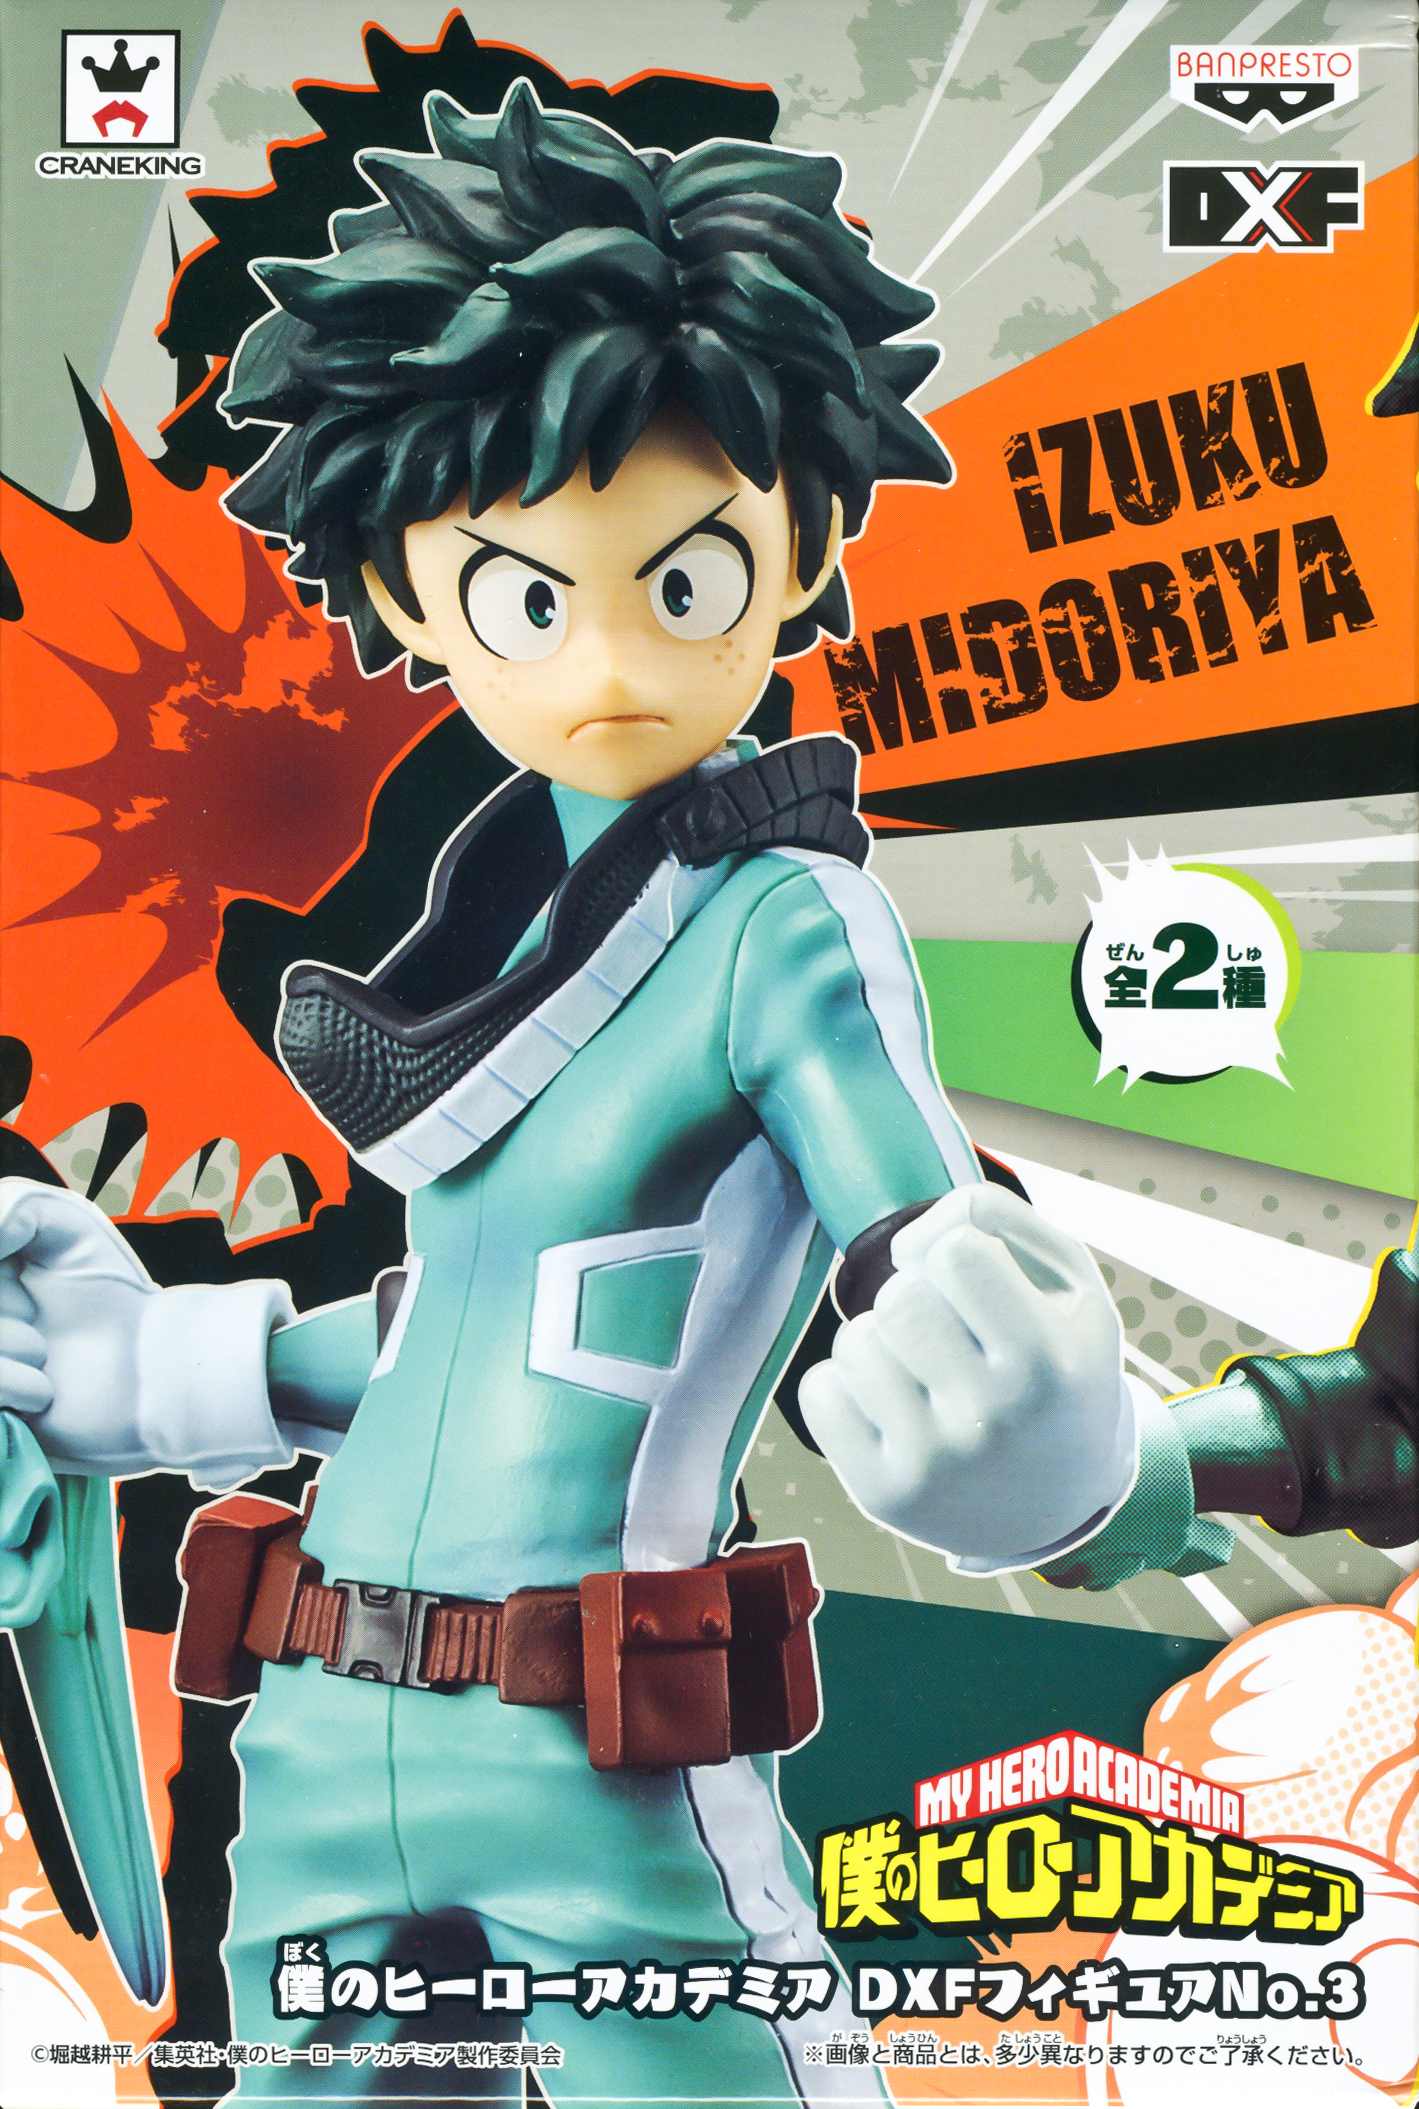 Izuku Midoriya, DXF Figure No.3, My Hero Academia, Banpresto